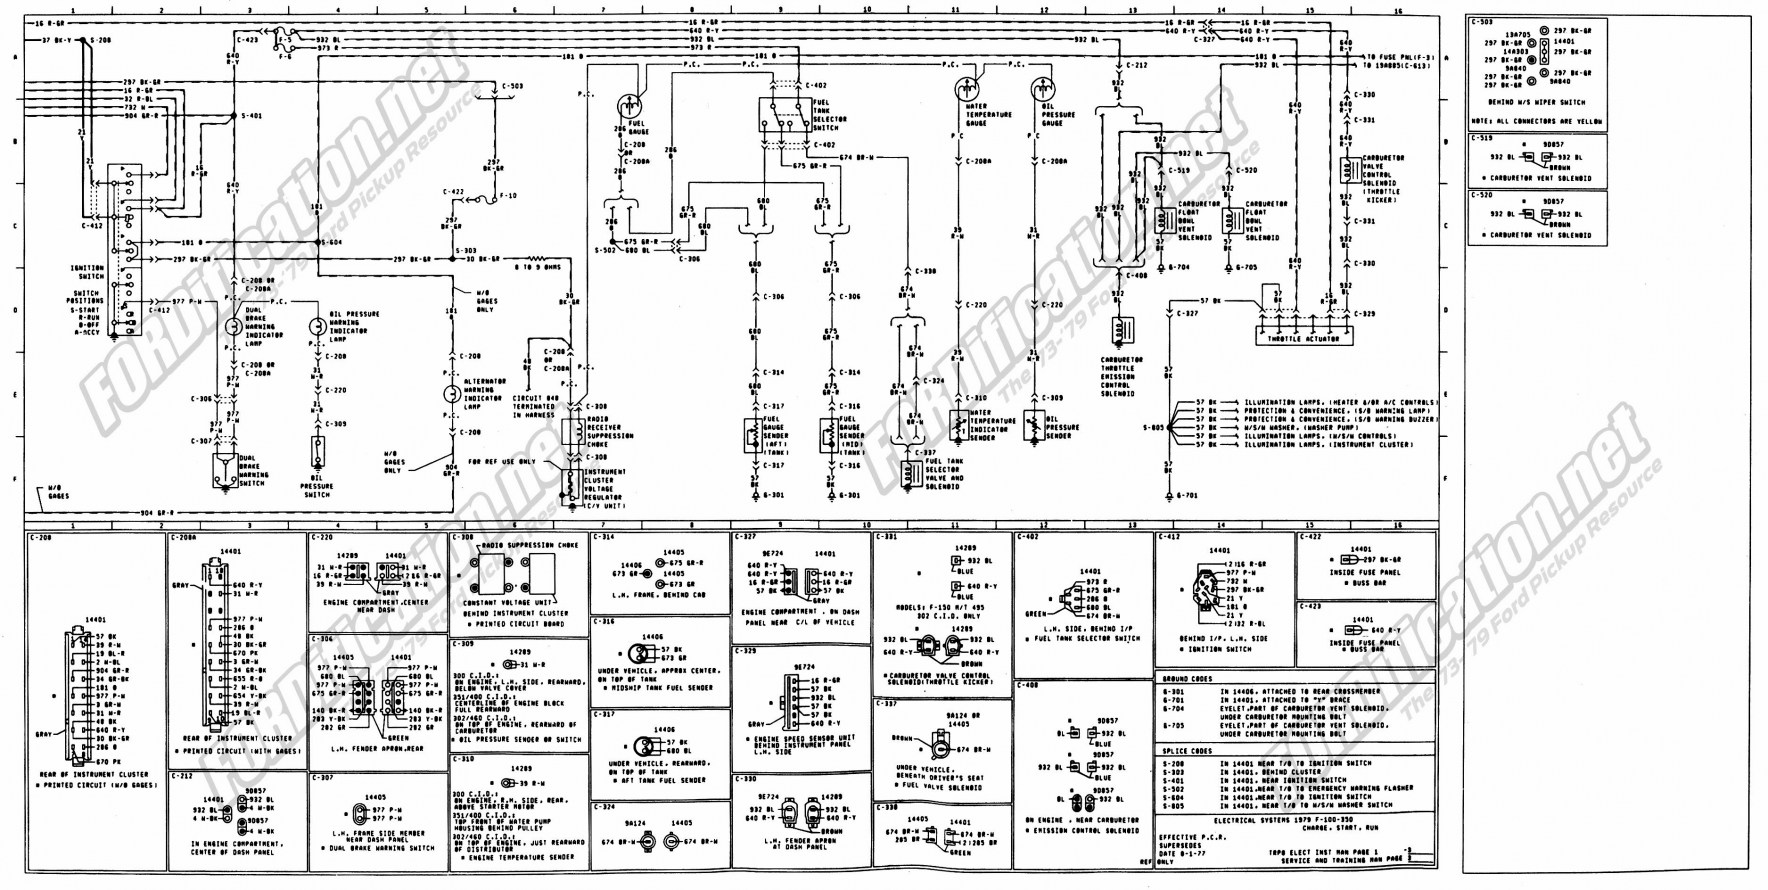 John Deere 4020 Fuel Gauge Wiring Diagram / John Deere